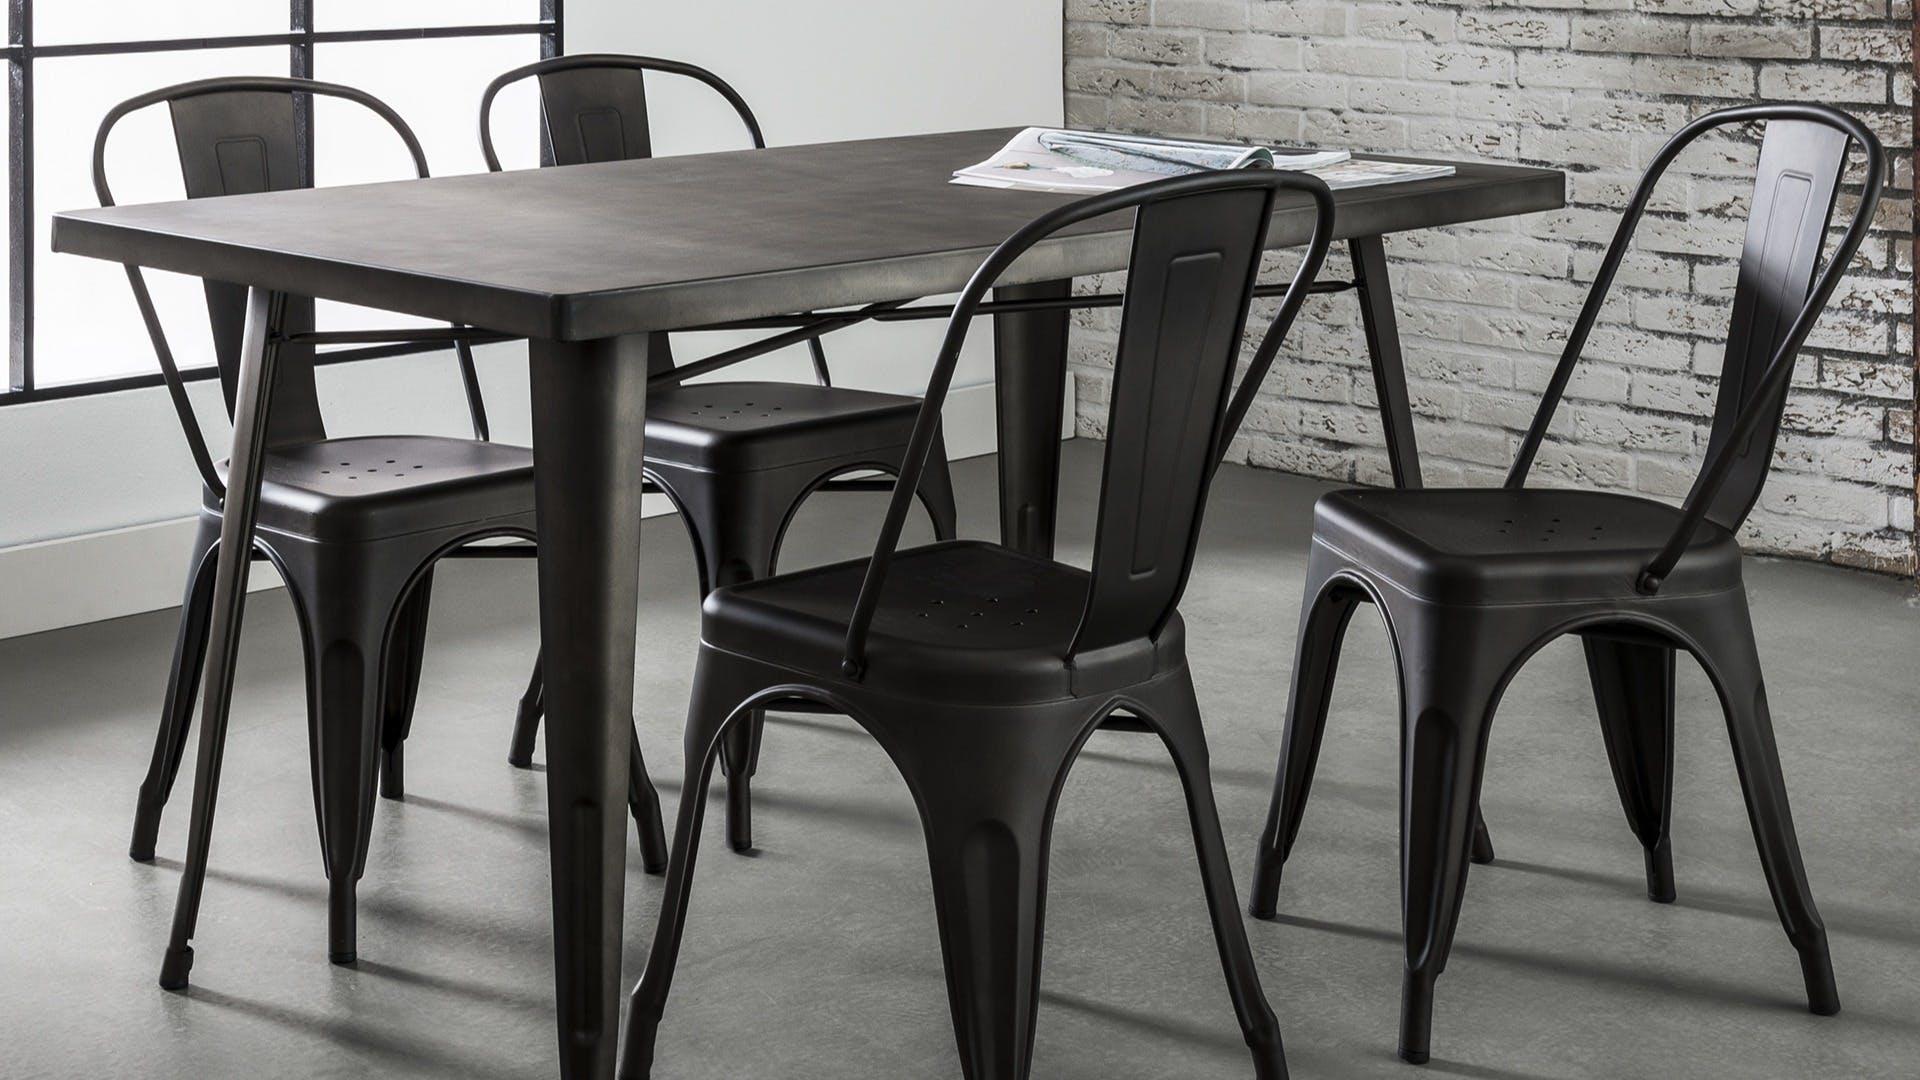 Meubles en métal : table basse, meuble tv...